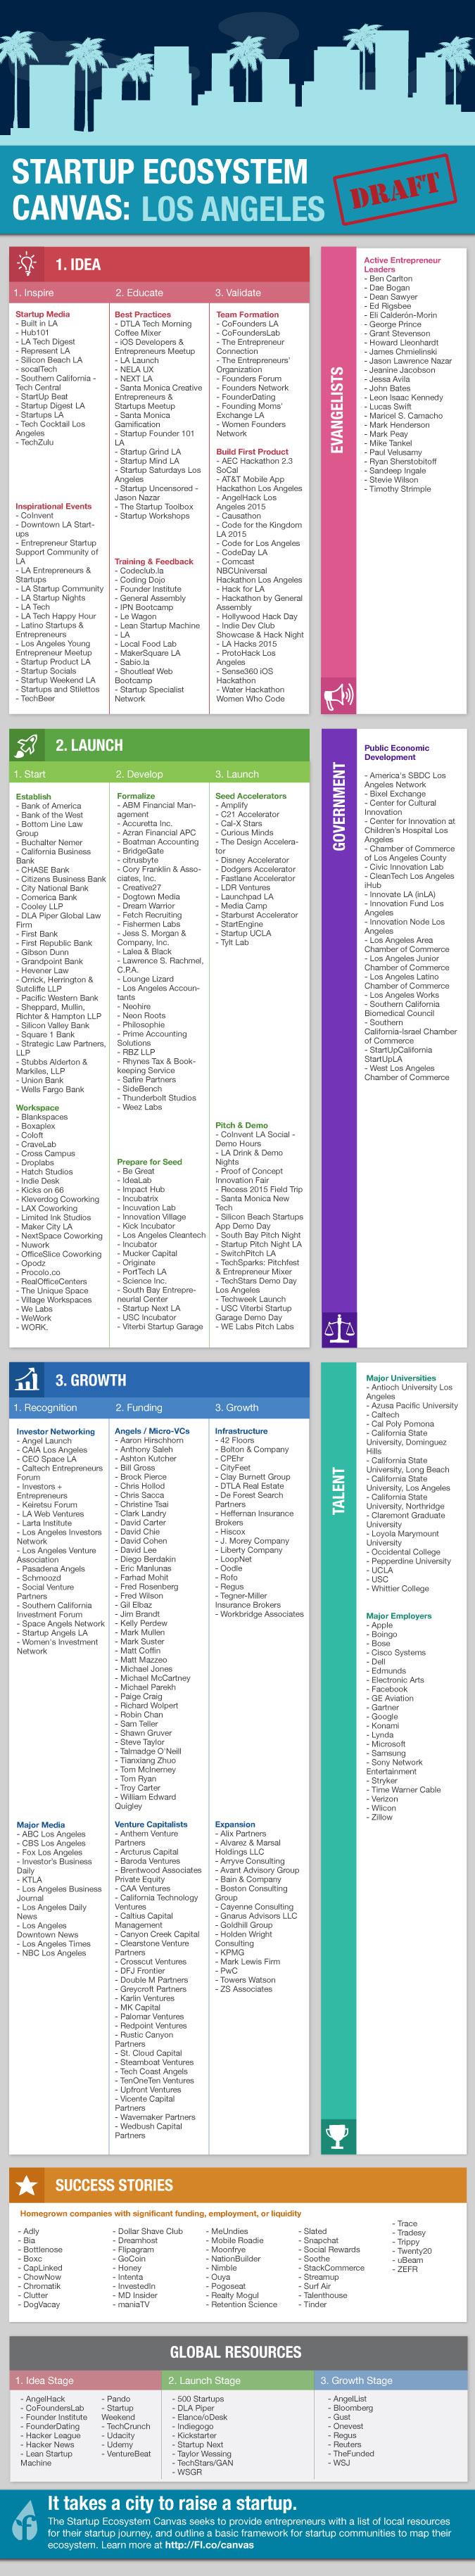 ecosystem_infographic_los_angeles_v1